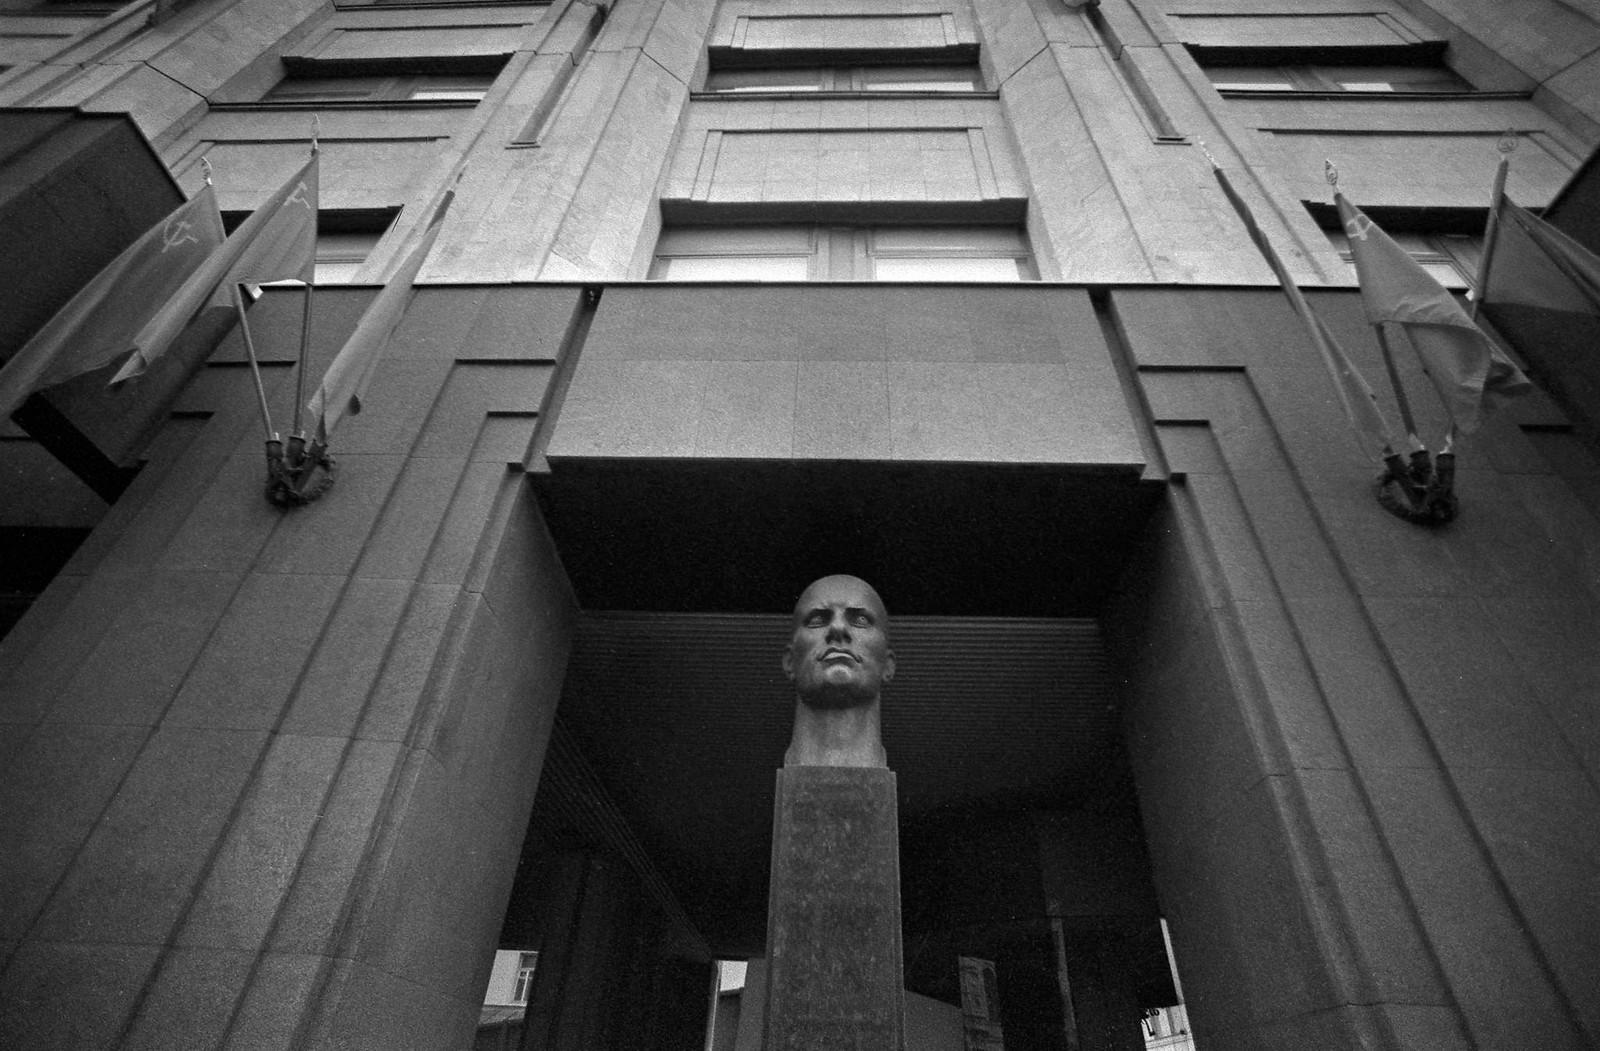 1985. Бюст Владимира Владимировича Маяковского перед входом в музей В. В. Маяковского на Лубянской площади (2)